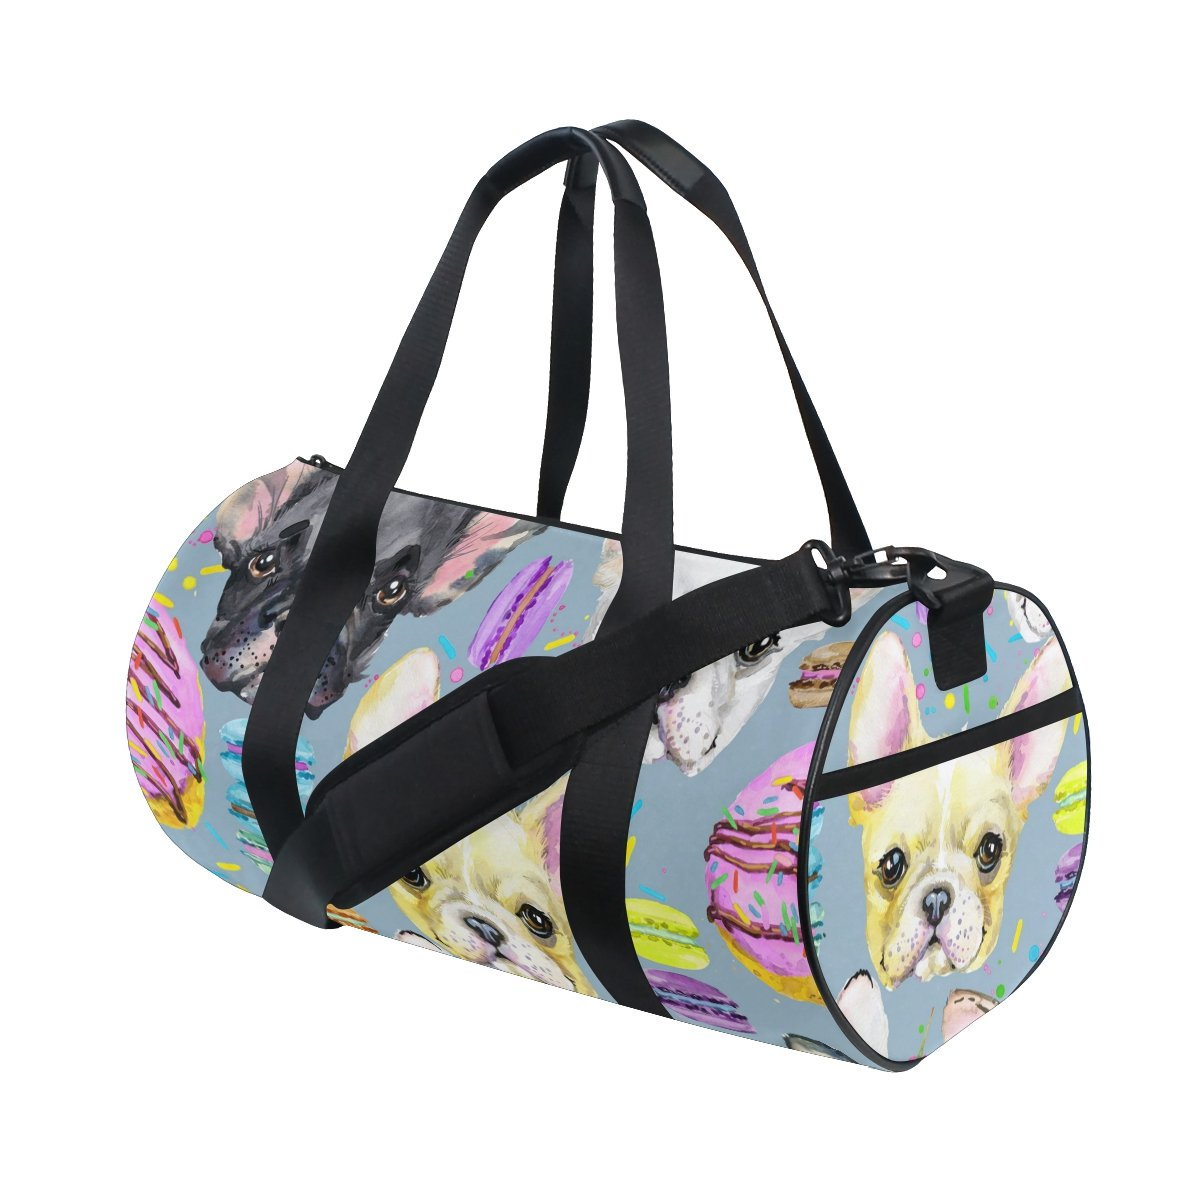 Naanle French Bulldog Puppy Dog Pattern Sweet Dessert Macaron Gym bag Sports Travel Duffle Bags for Men Women Boys Girls Kids